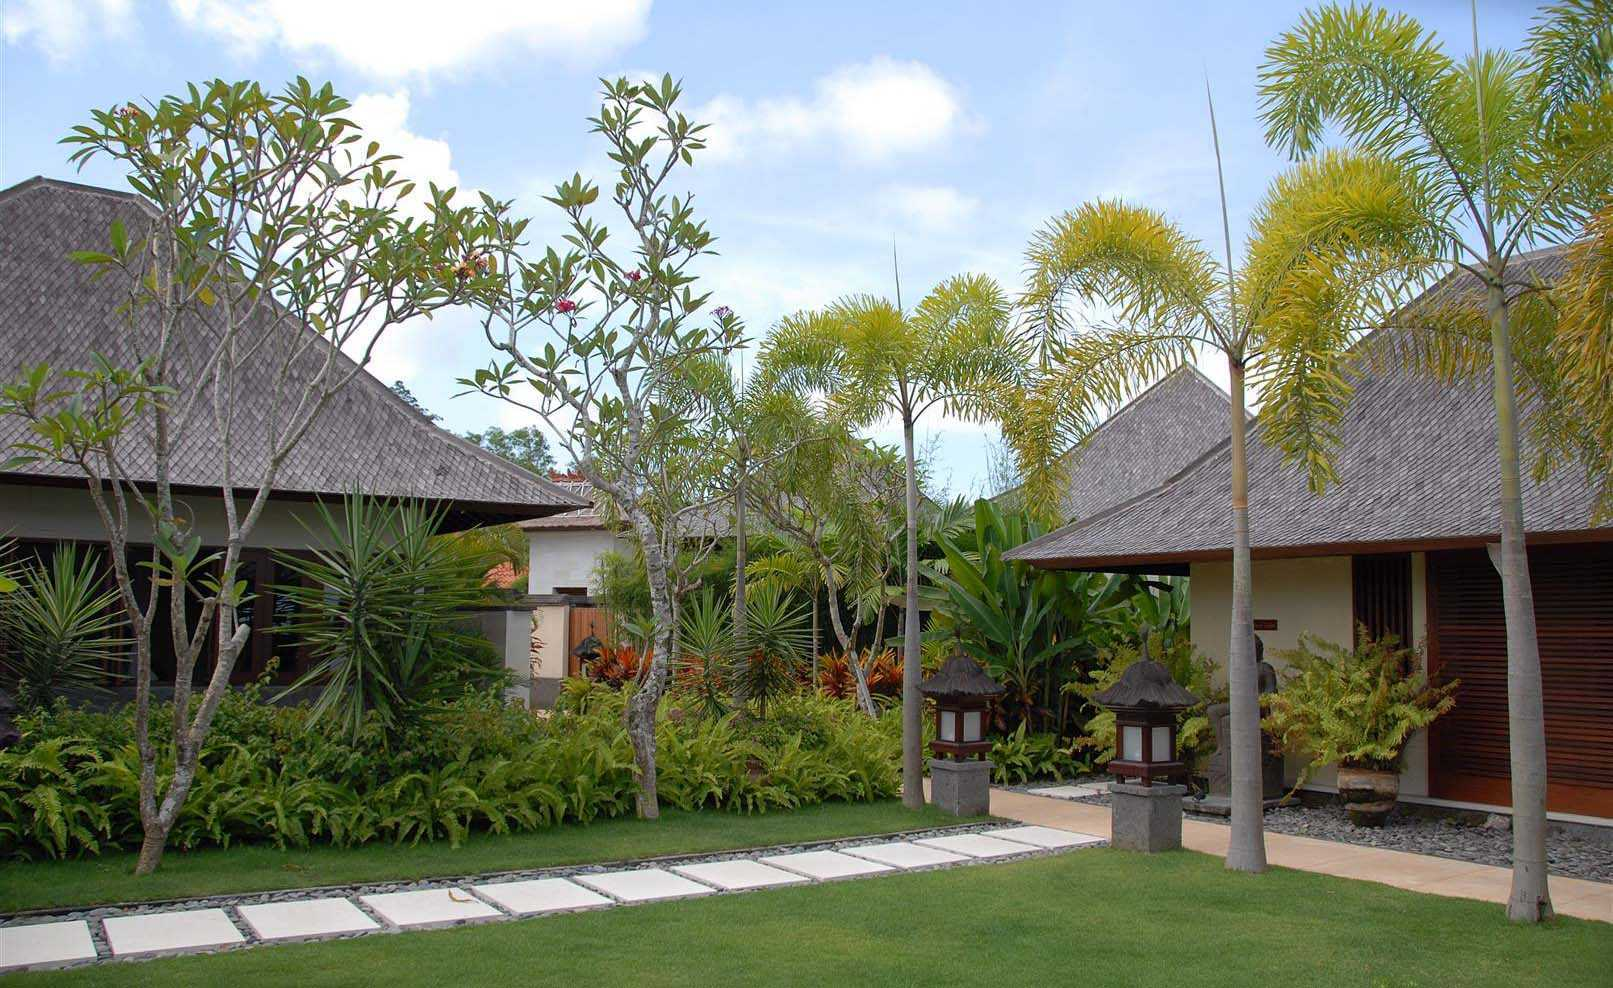 Agung Budi Raharsa | Architecture & Engineering Villa Indah Manis - Bali Bali, Indonesia Pecatu, Bali Bedroom Units   12412